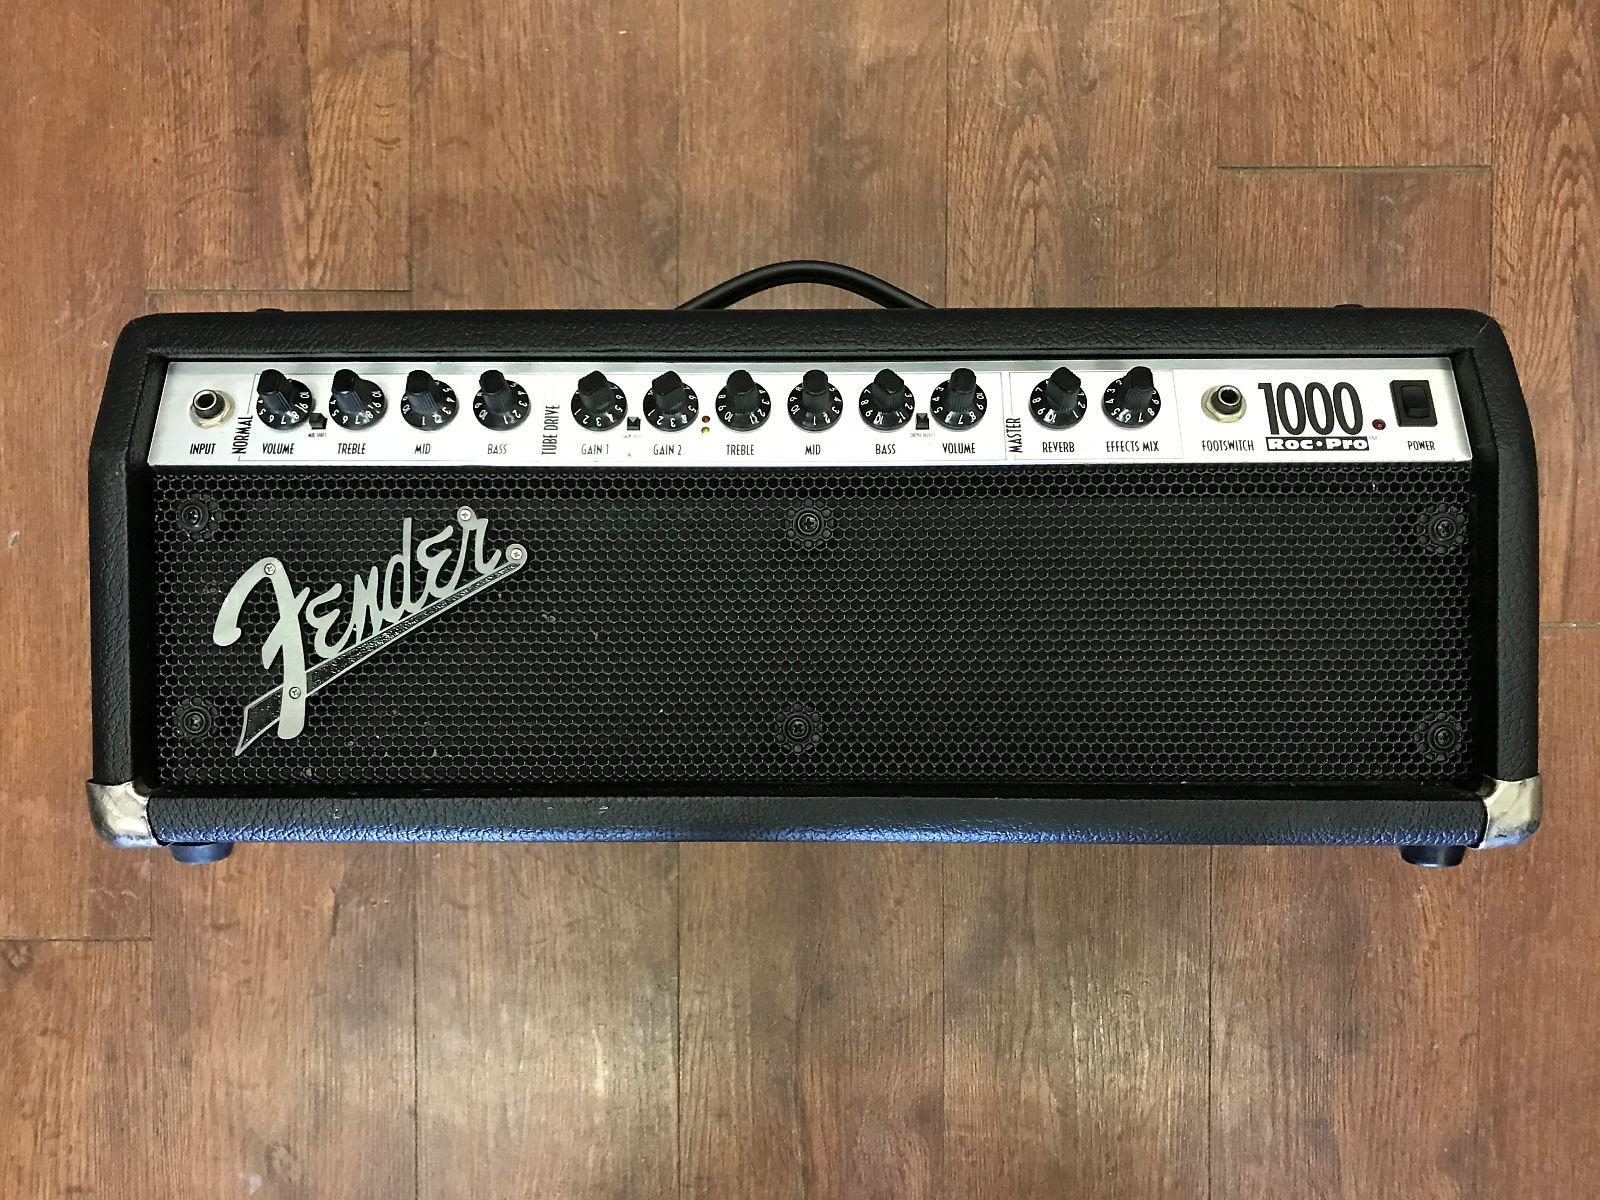 fender roc pro 1000 2 channel 100 watt hybrid guitar amp head reverb. Black Bedroom Furniture Sets. Home Design Ideas